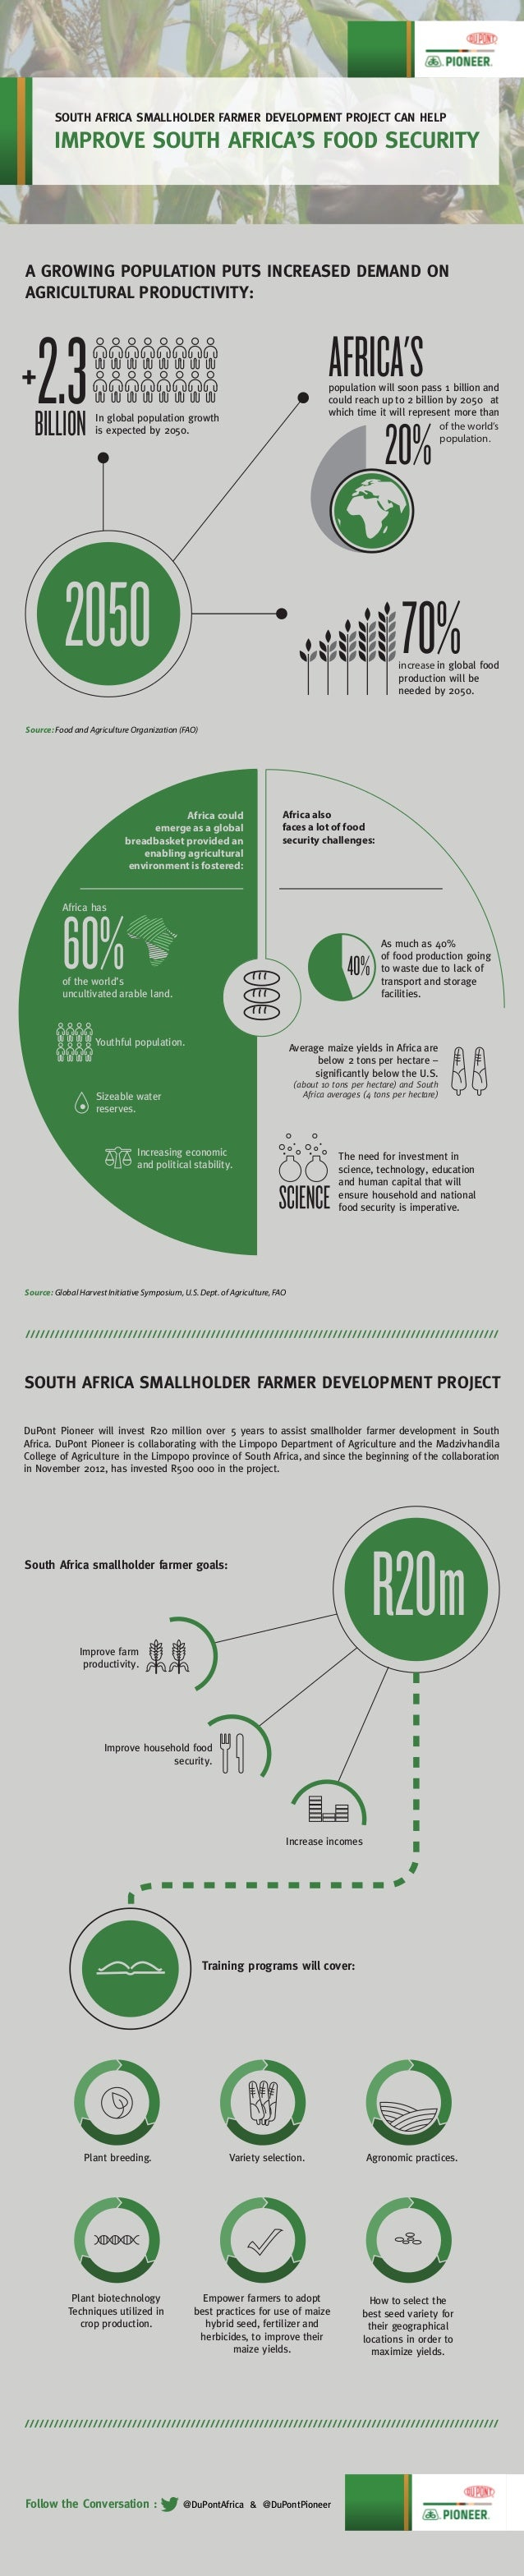 South Africa Smallholder Farmer Project